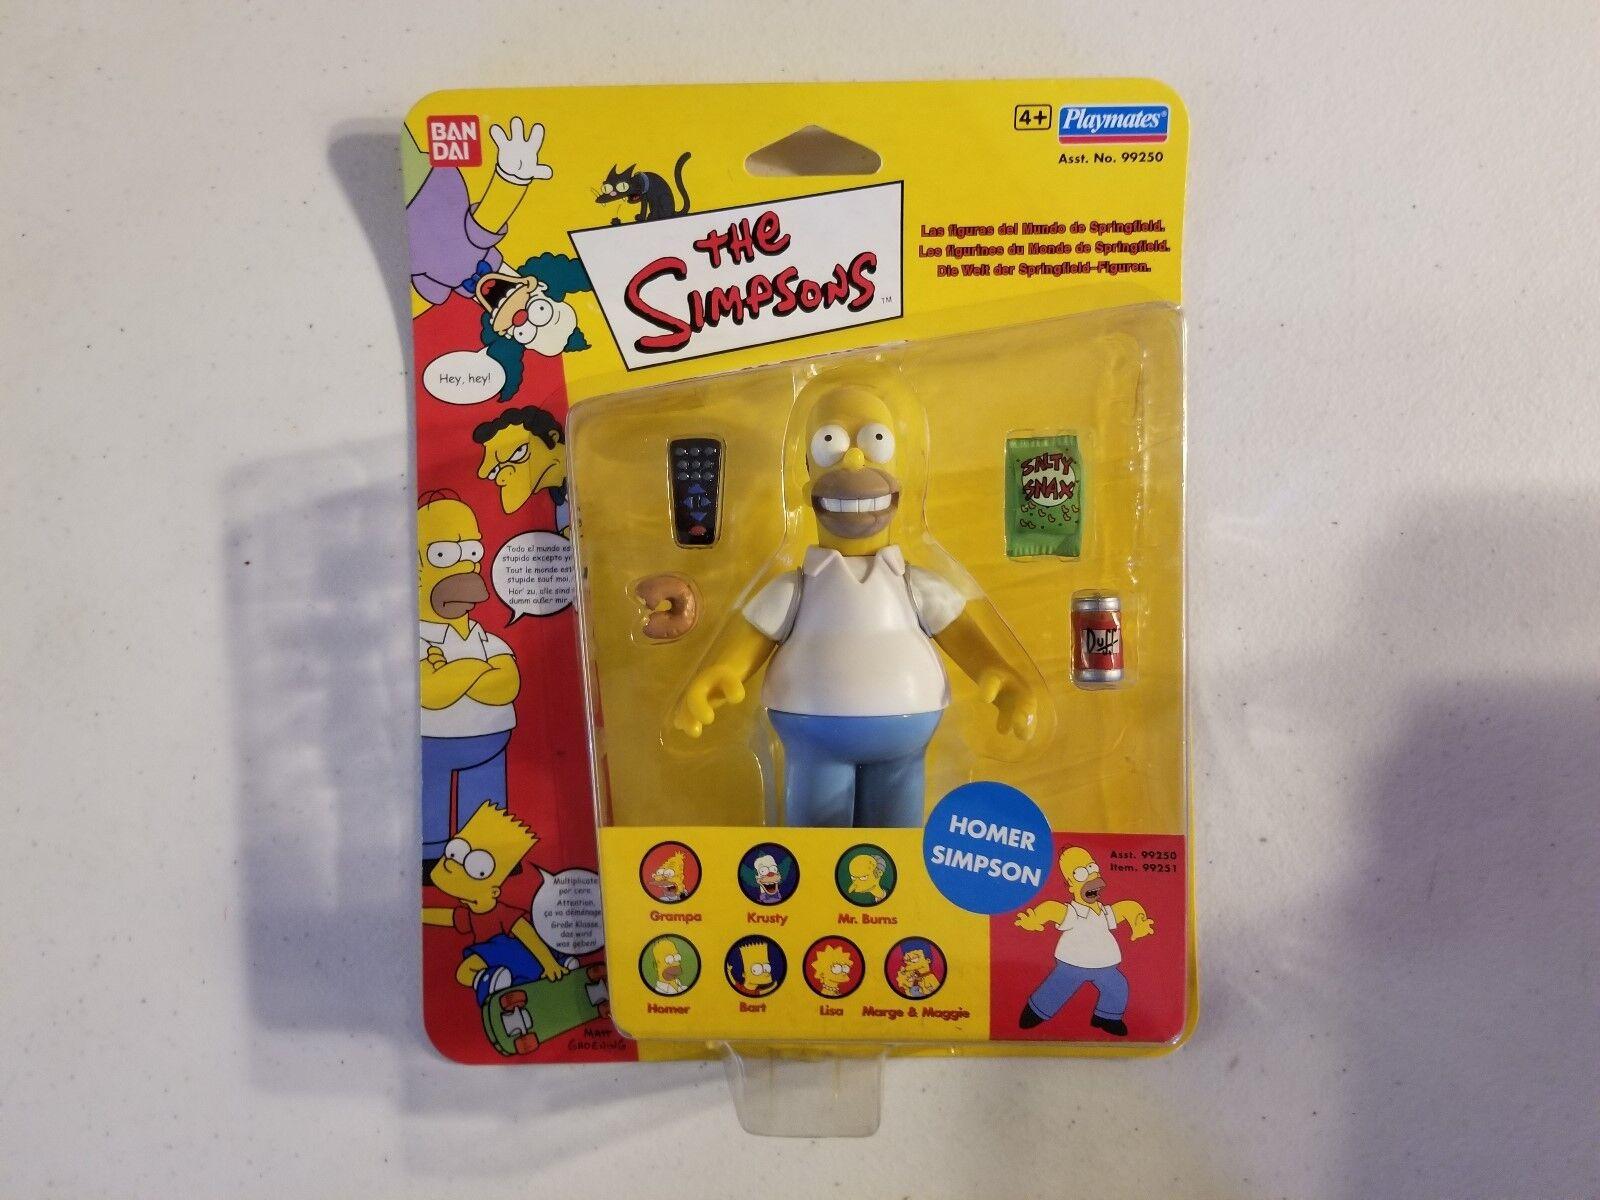 The Simpsons Homer Simpson Bandai Bandai Bandai Import Action Figure a259a2